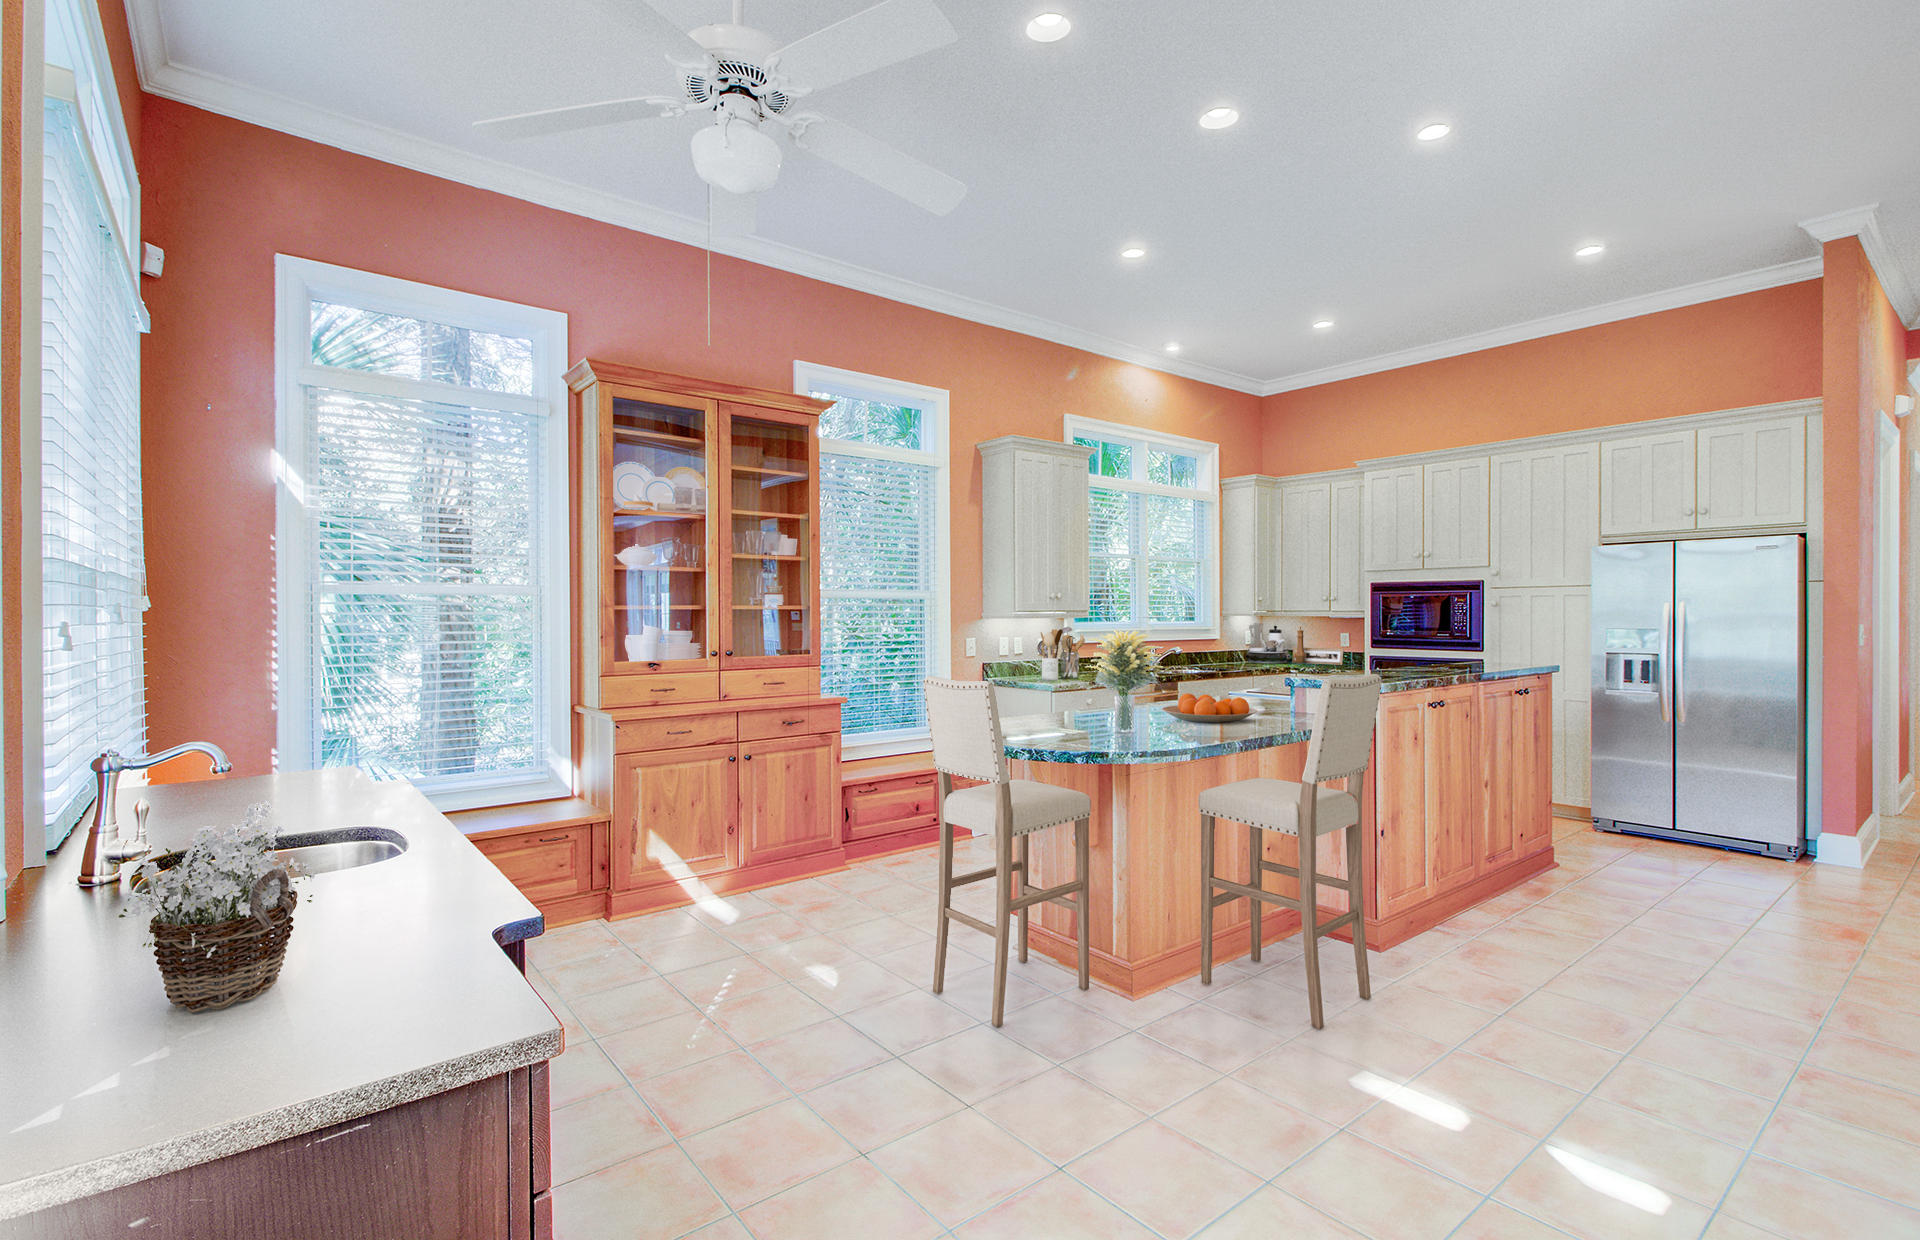 Kiawah Island Homes For Sale - 402 Ocean Oaks, Kiawah Island, SC - 41